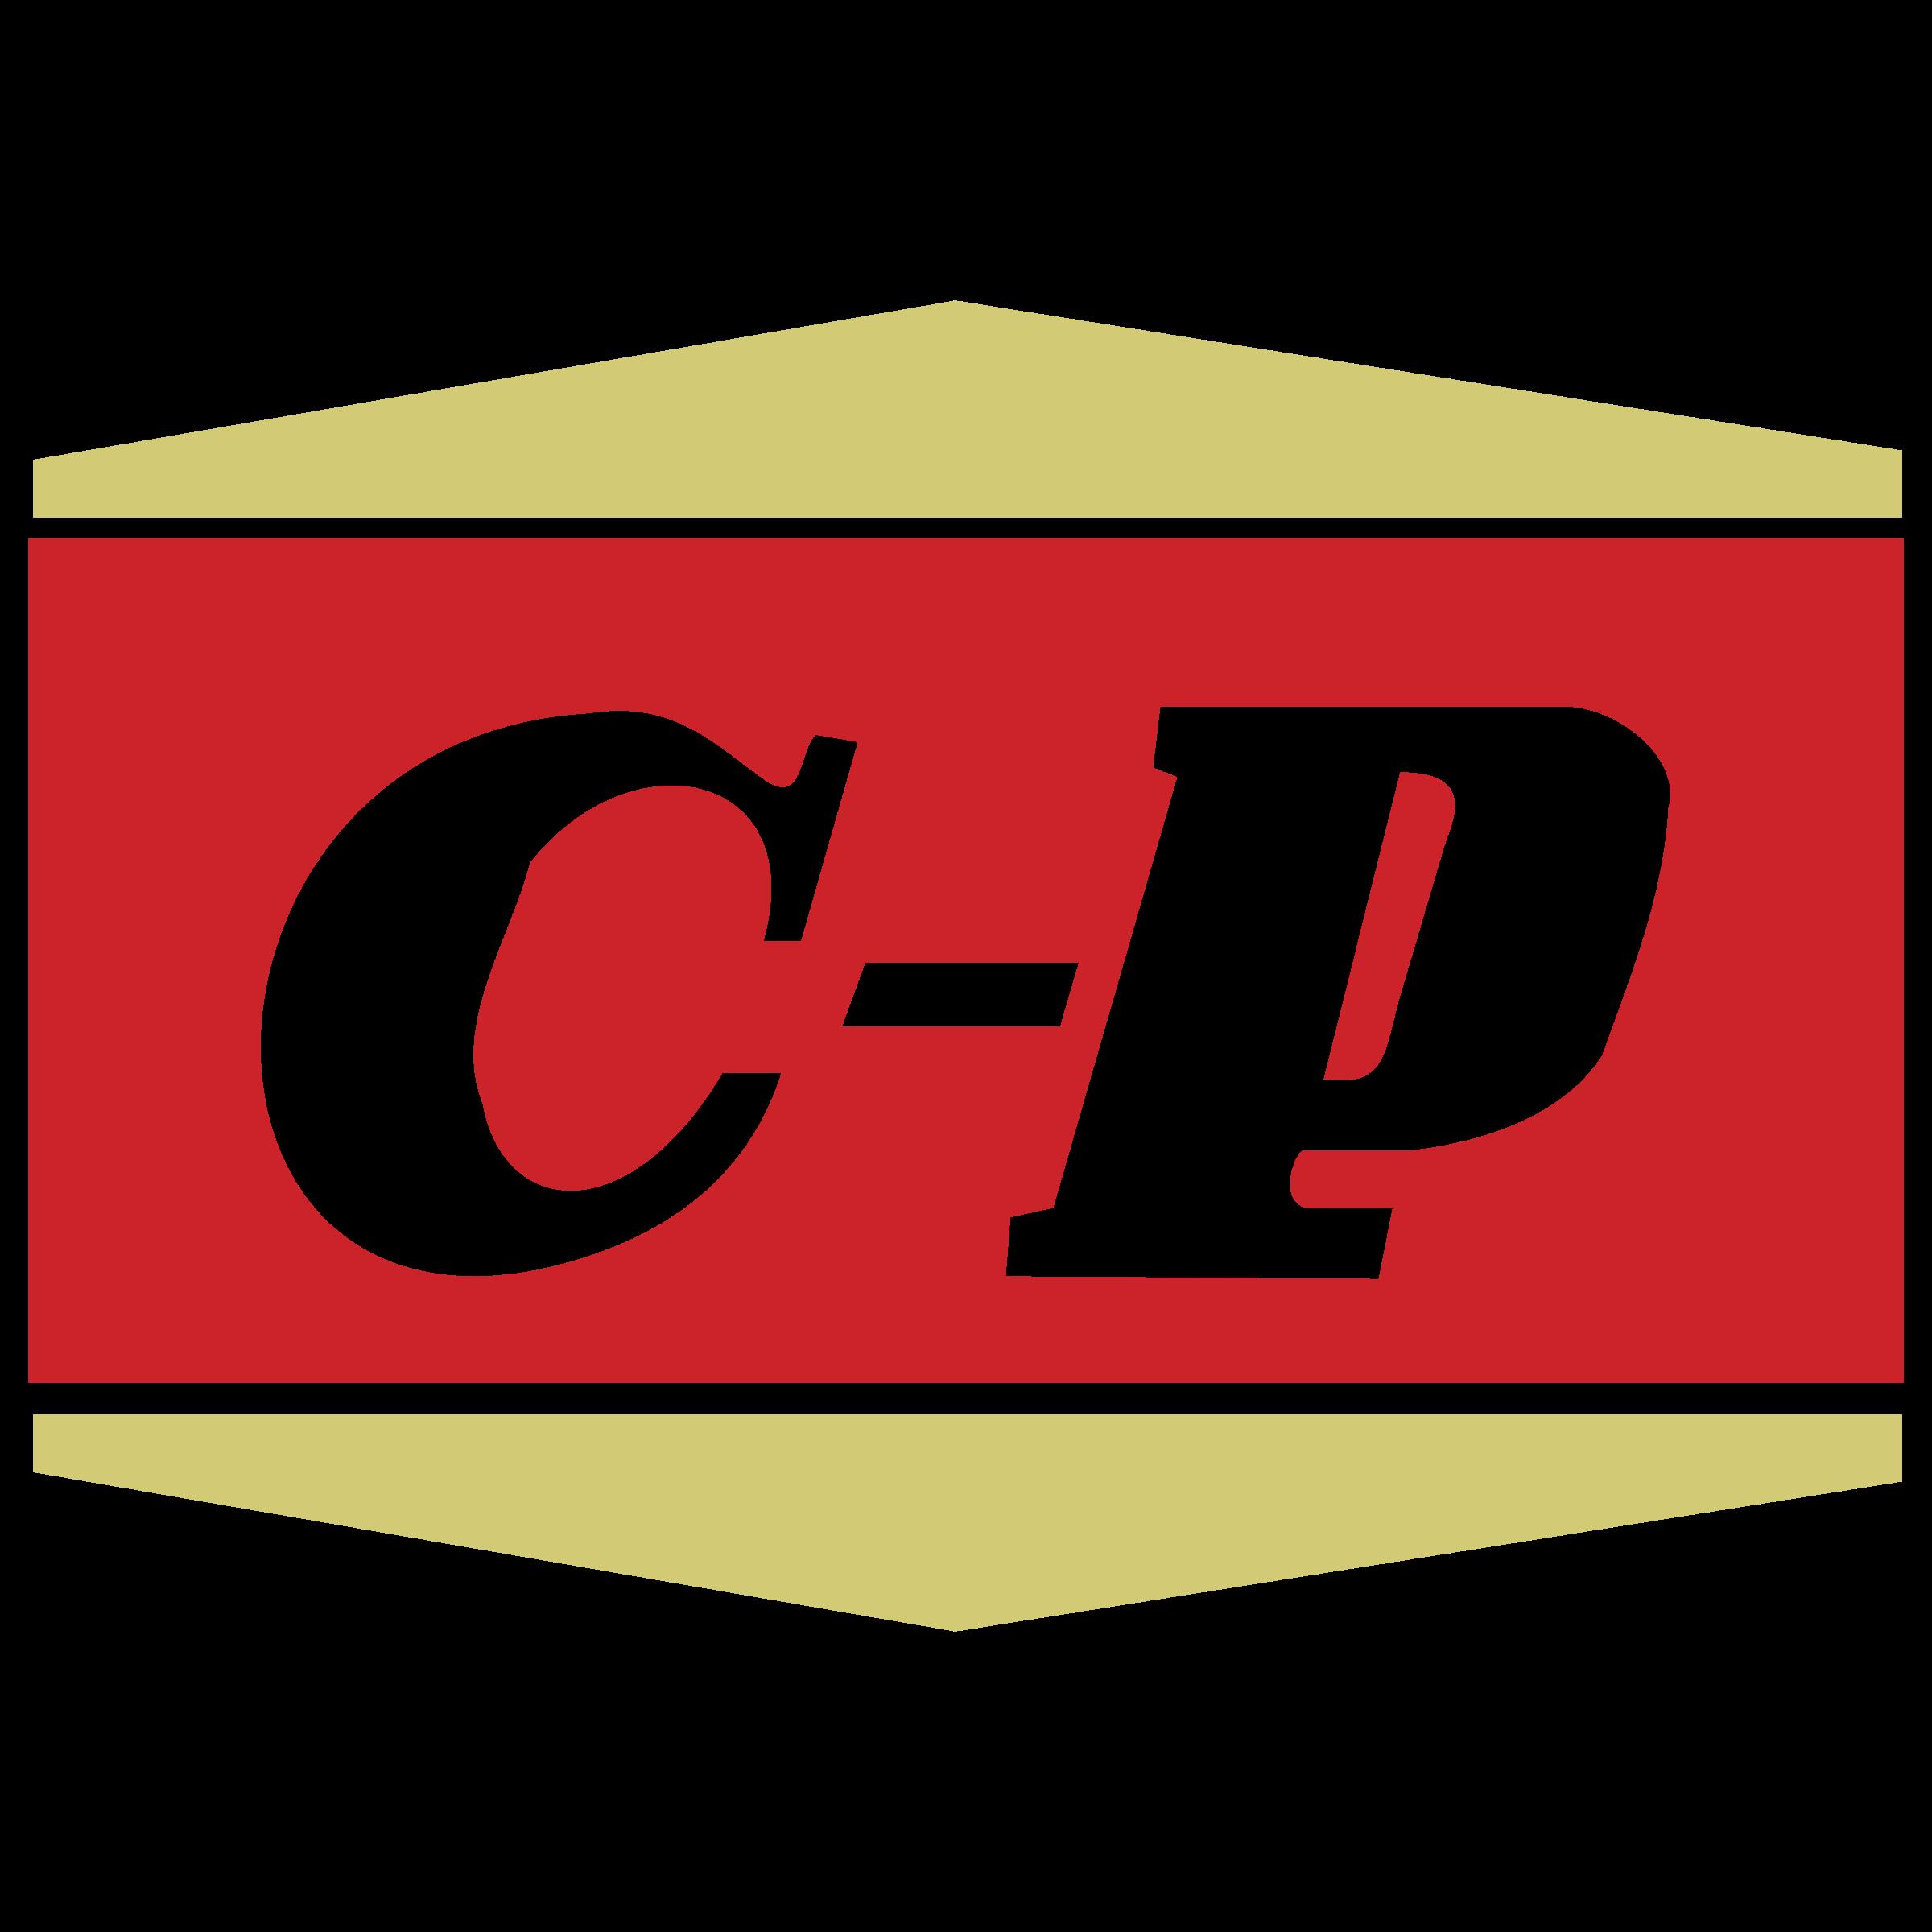 C P Logo PNG Transparent & SVG Vector.